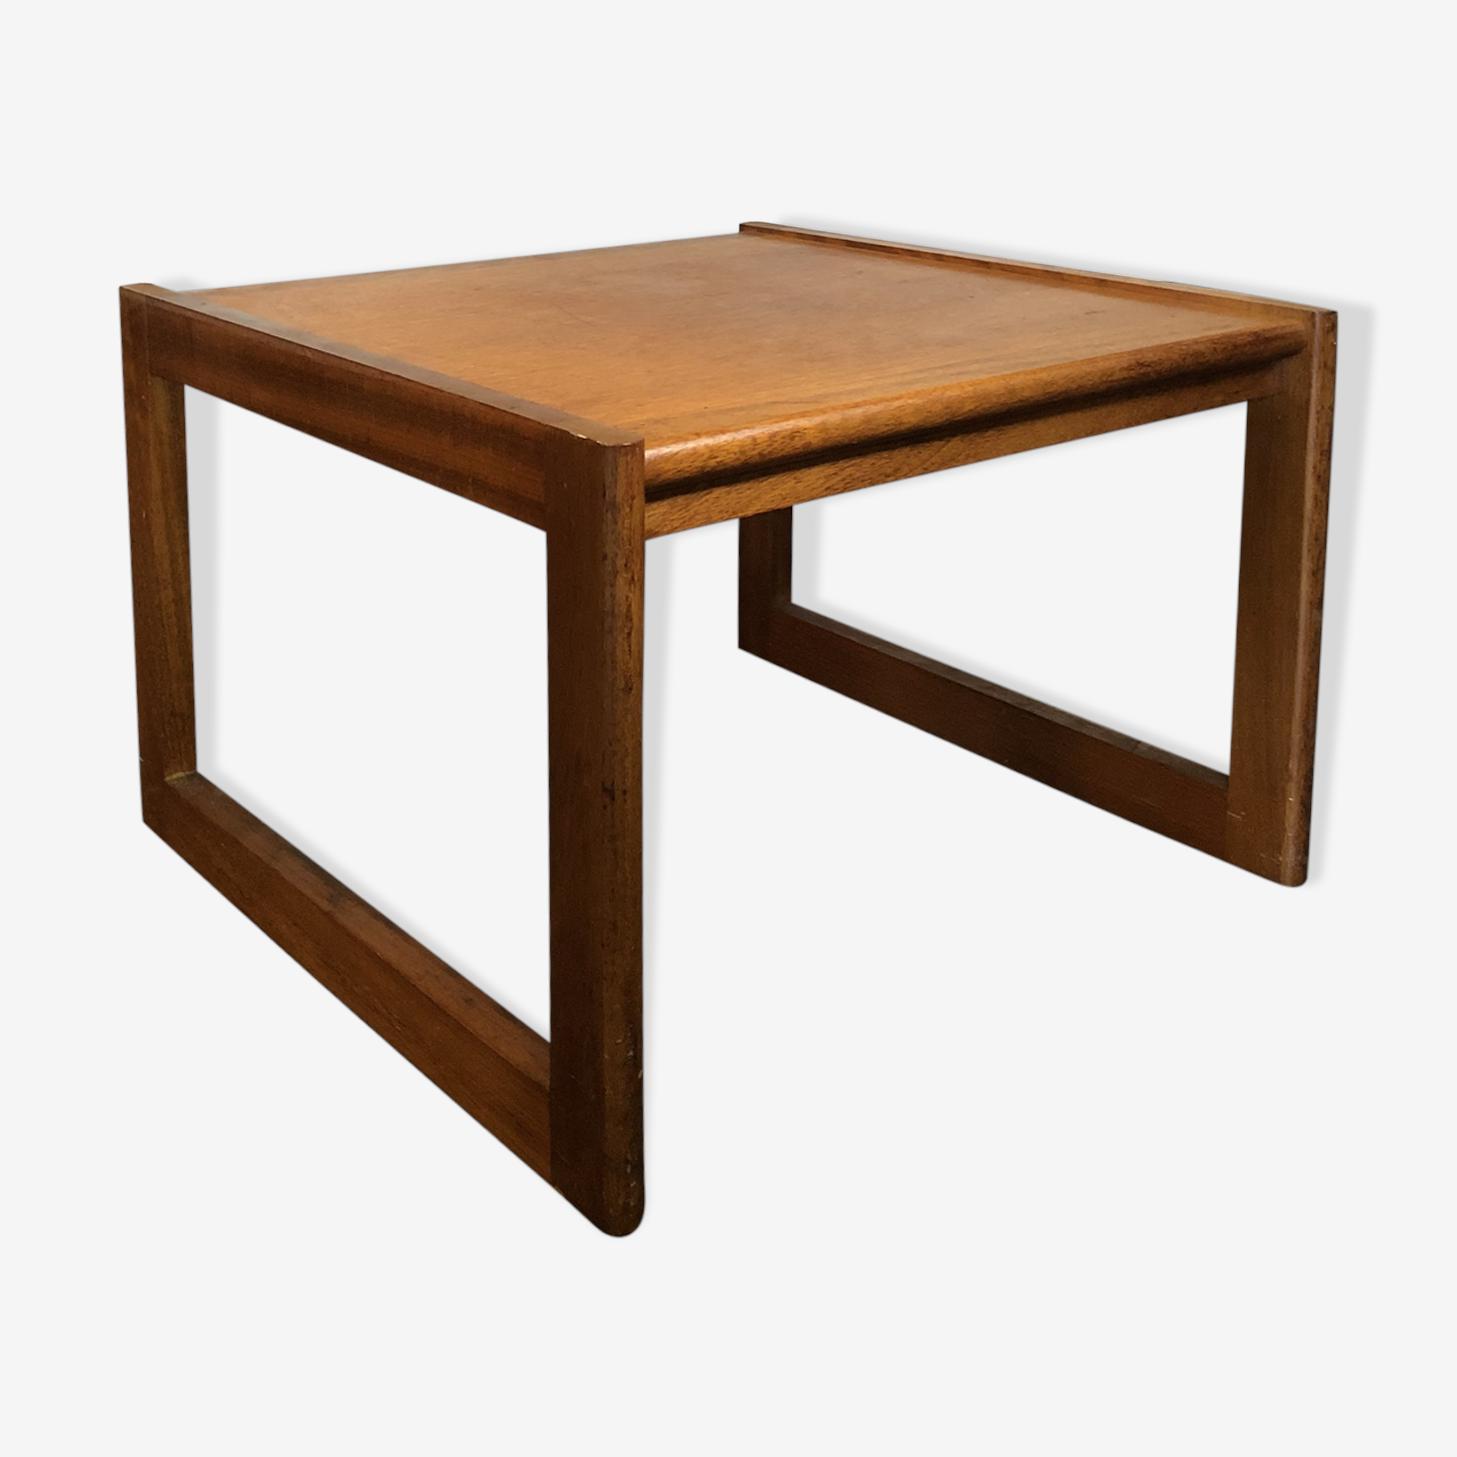 Vtg Mid Century BCM Teak Side Occasional Coffee Table Retro 60s Danish Design